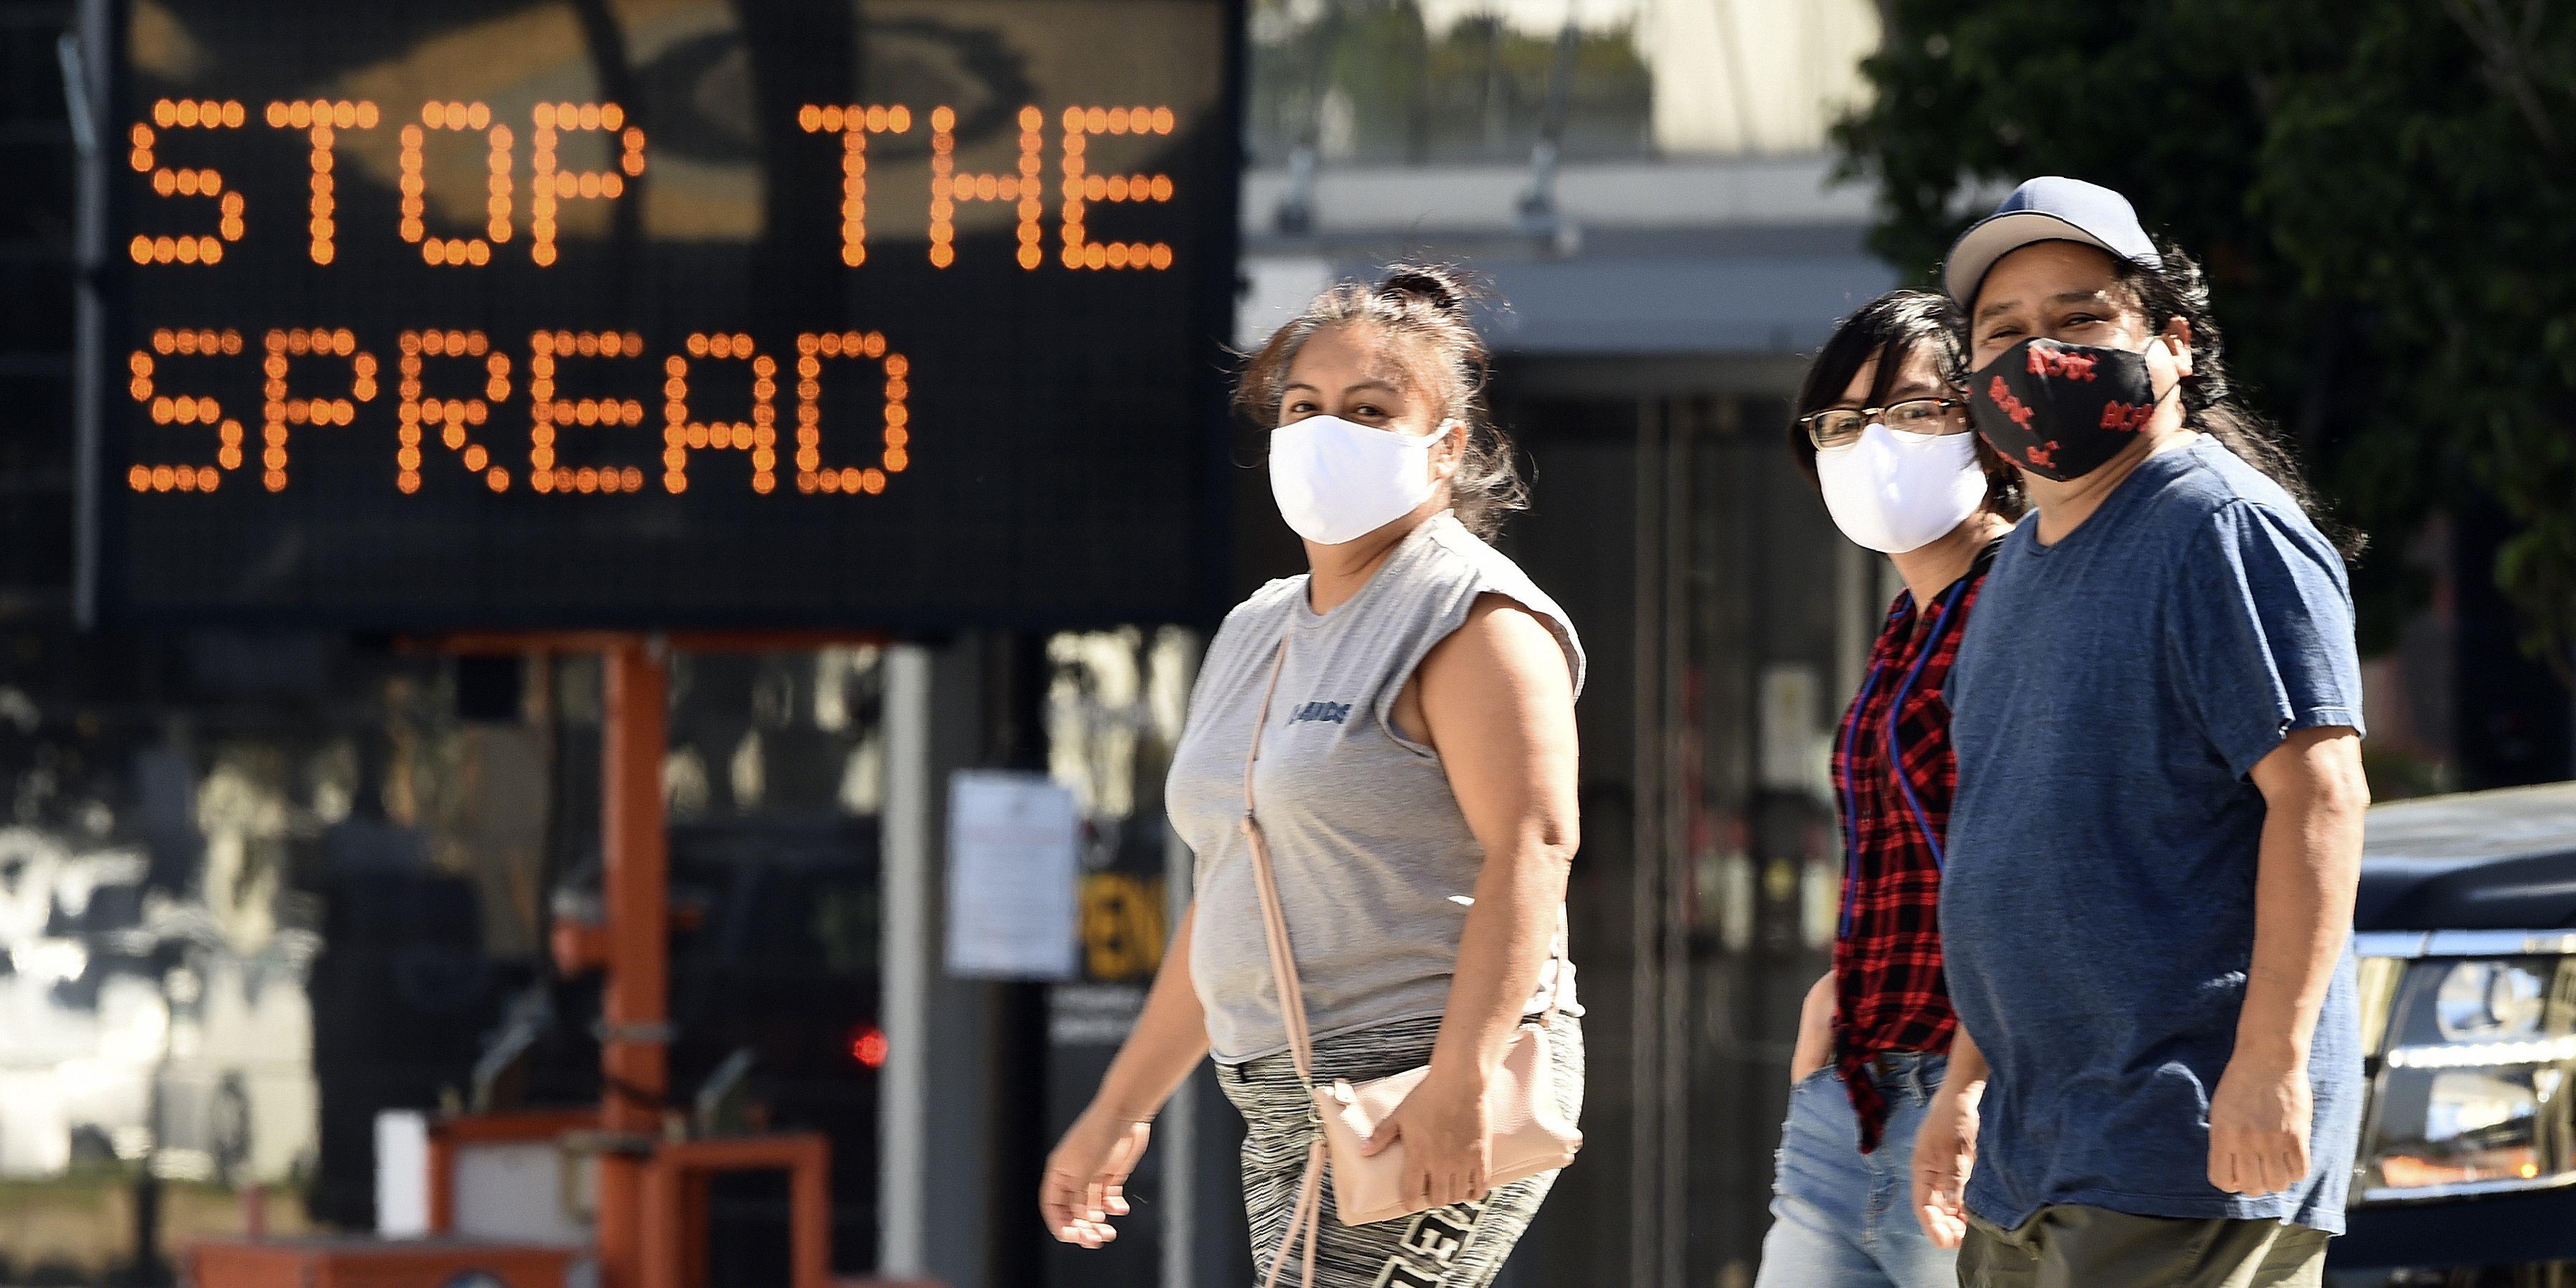 US tops 5 million confirmed coronavirus cases, to Europe's alarm